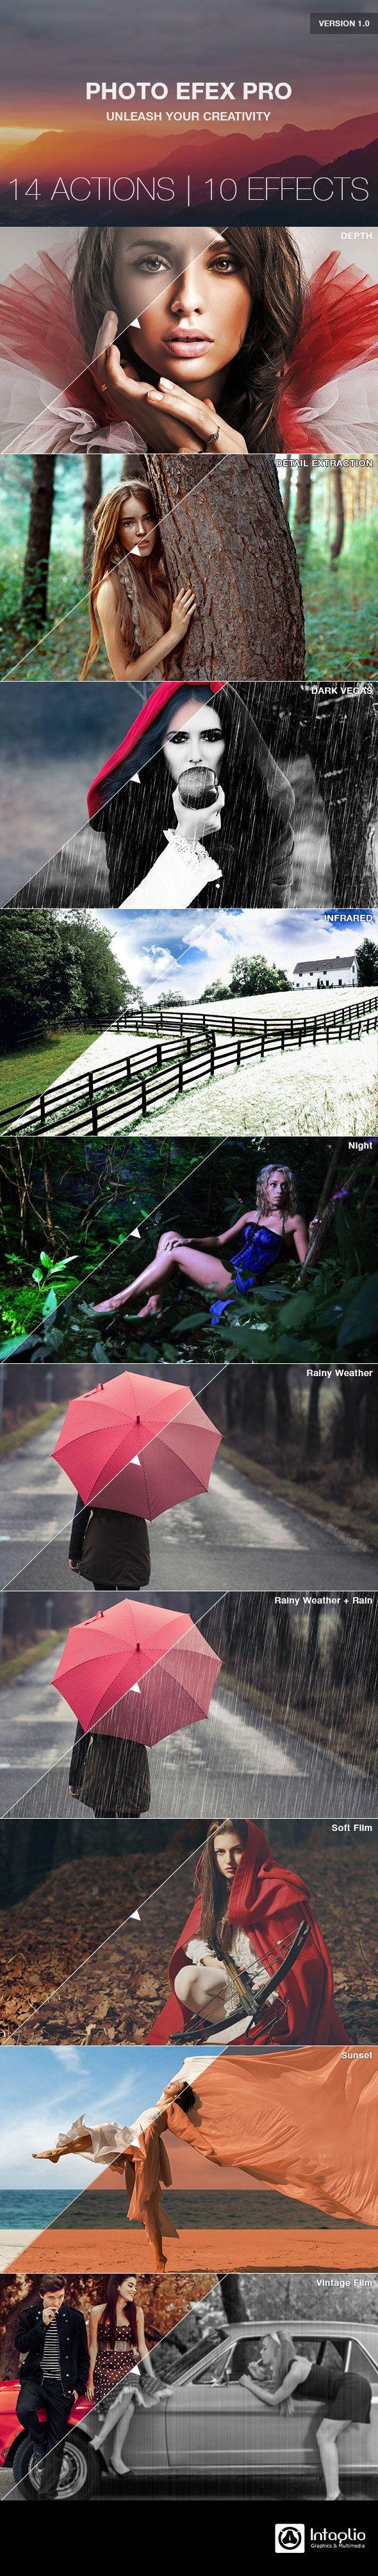 Photo Efex Pro Photoshop Actions #photoeffect